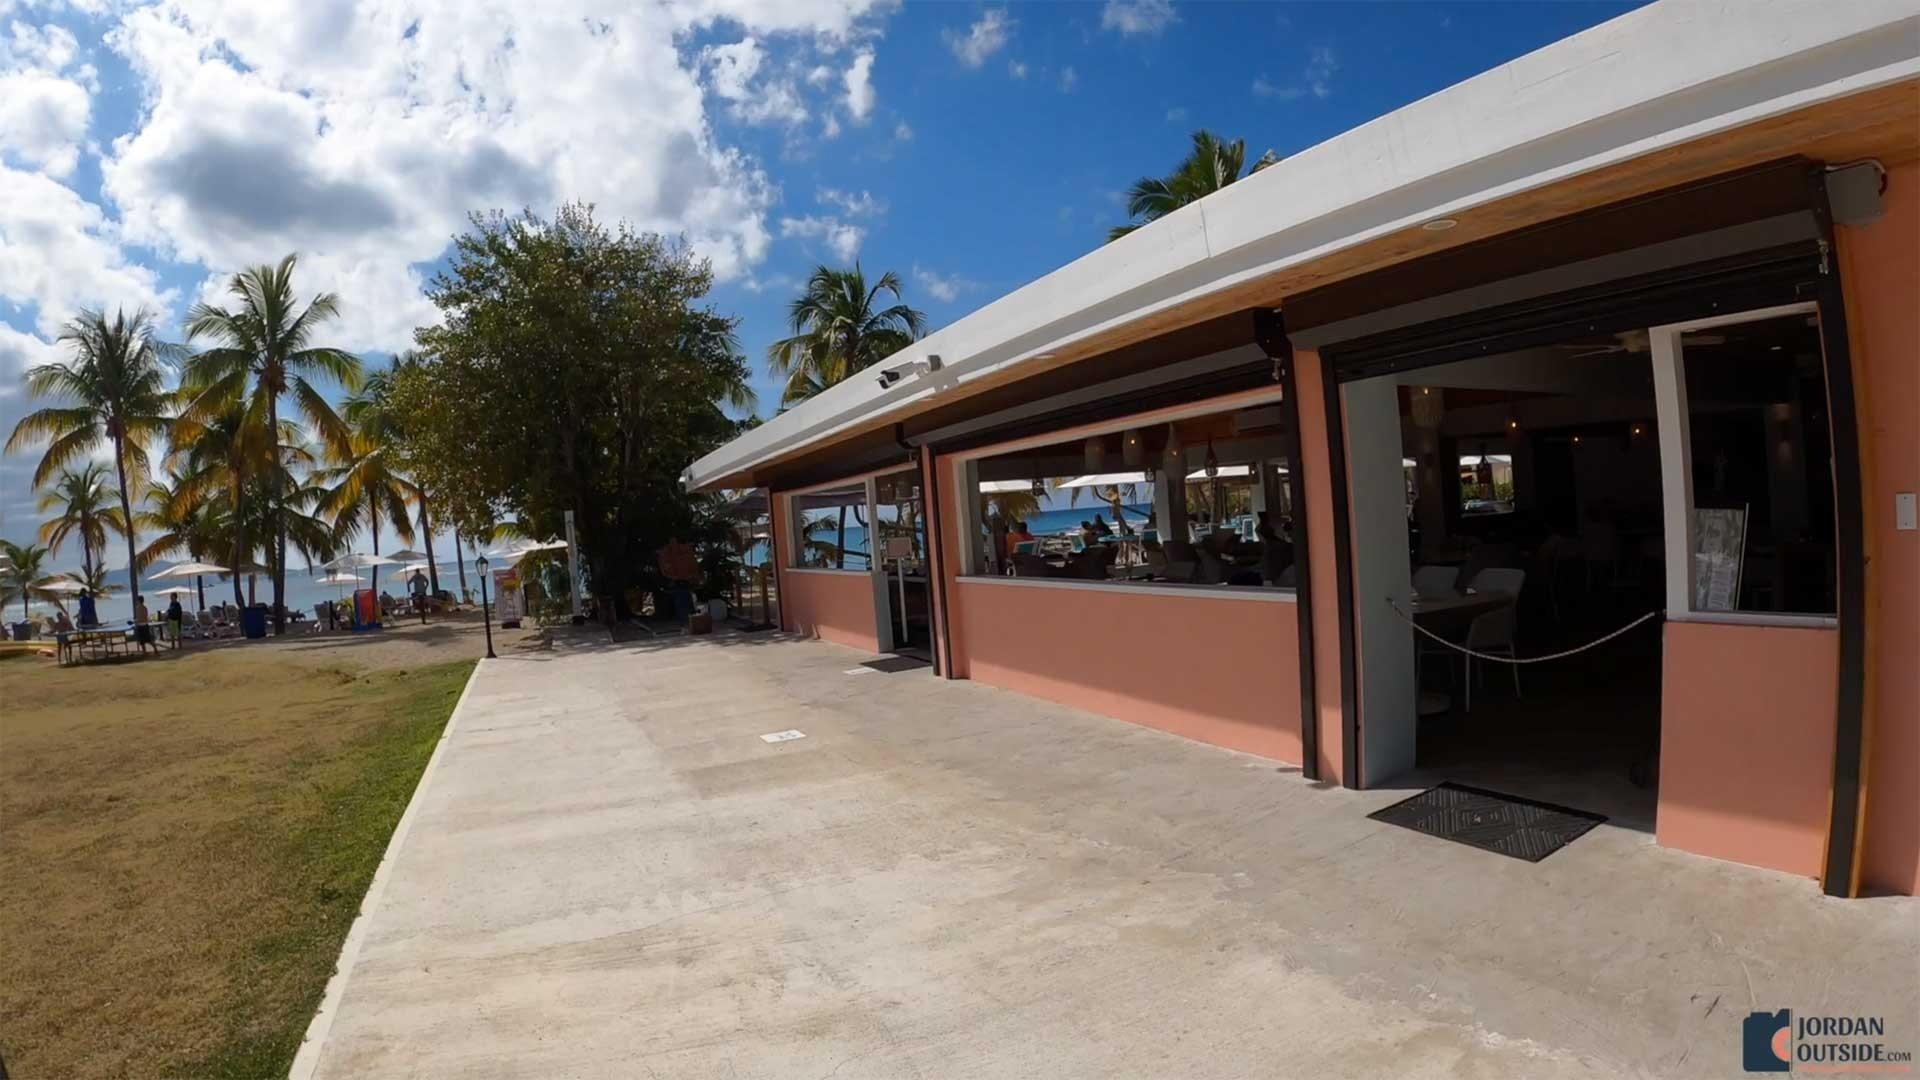 The restaurant at Mermaid Beach